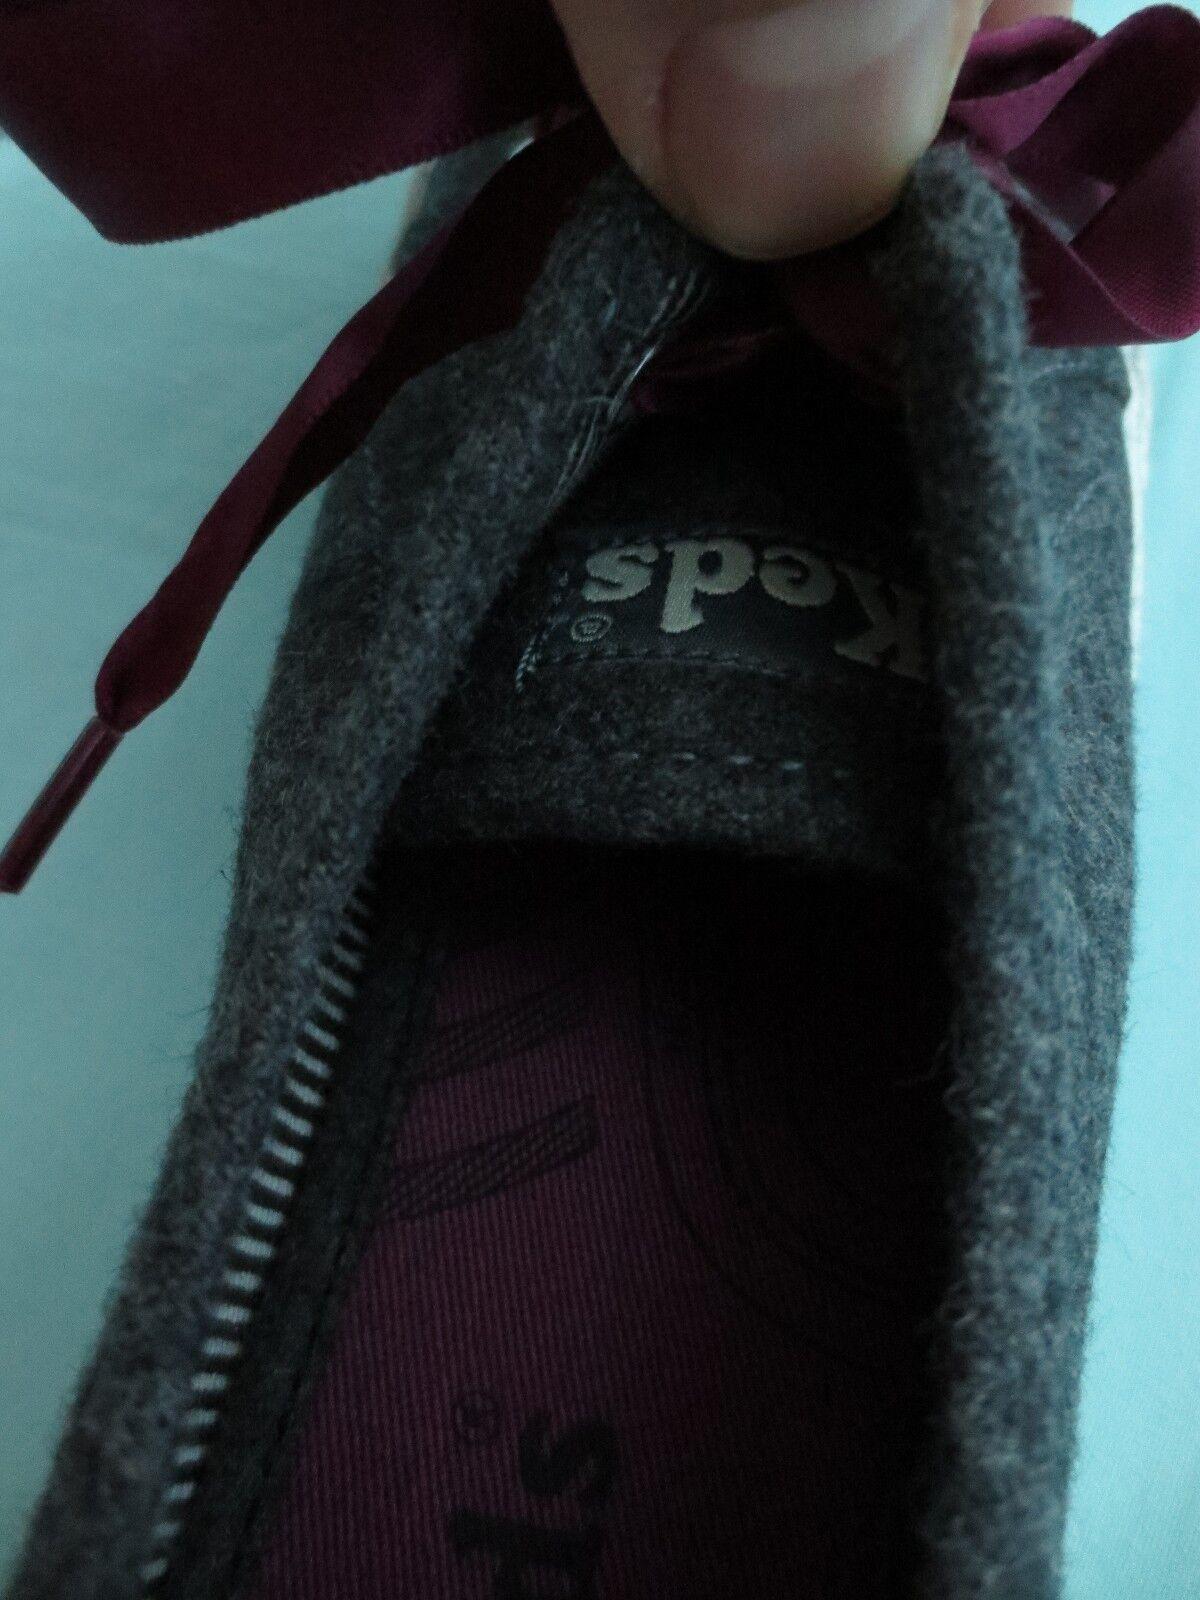 KEDS Damenschuhe Schuhe Größe 6.5 M  CELEB WOOL  CHARCOAL Gray LACE-UP SNEAKERS  WOOL NIB 7145fc